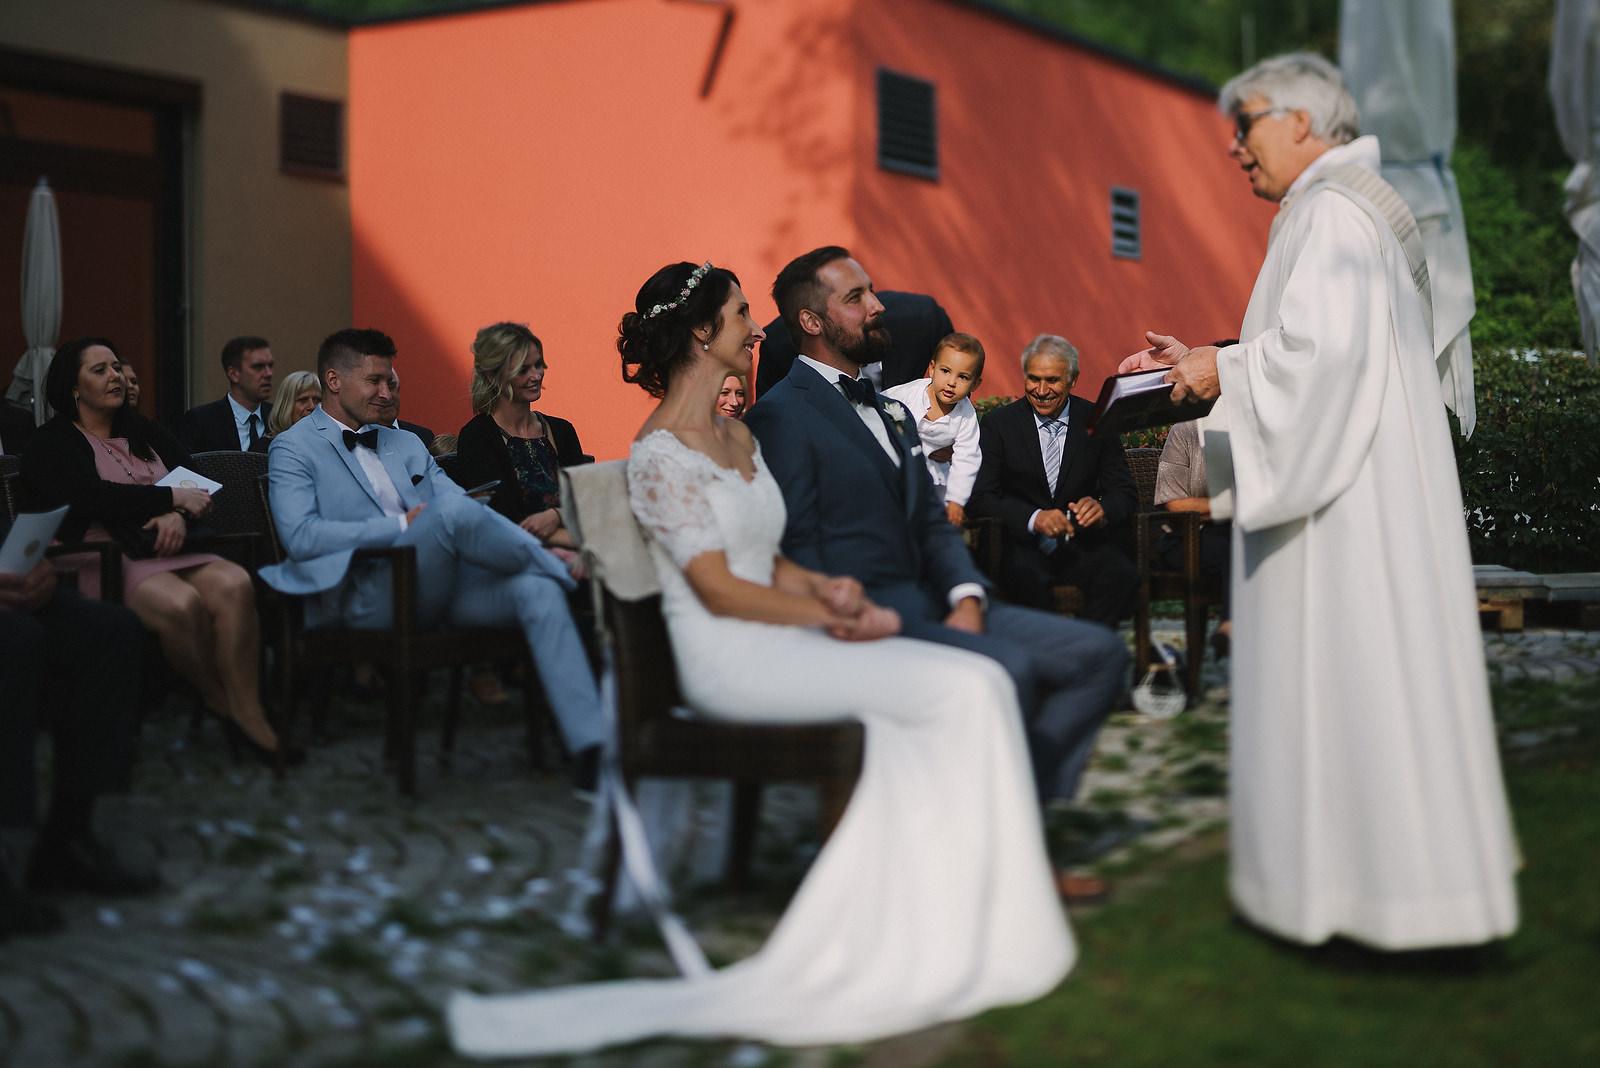 Fotograf Konstanz - Hochzeitsfotograf Reutlingen Achalm Hochzeit EFP 45 - Als Hochzeitsfotograf auf der Achalm, Reutlingen  - 36 -